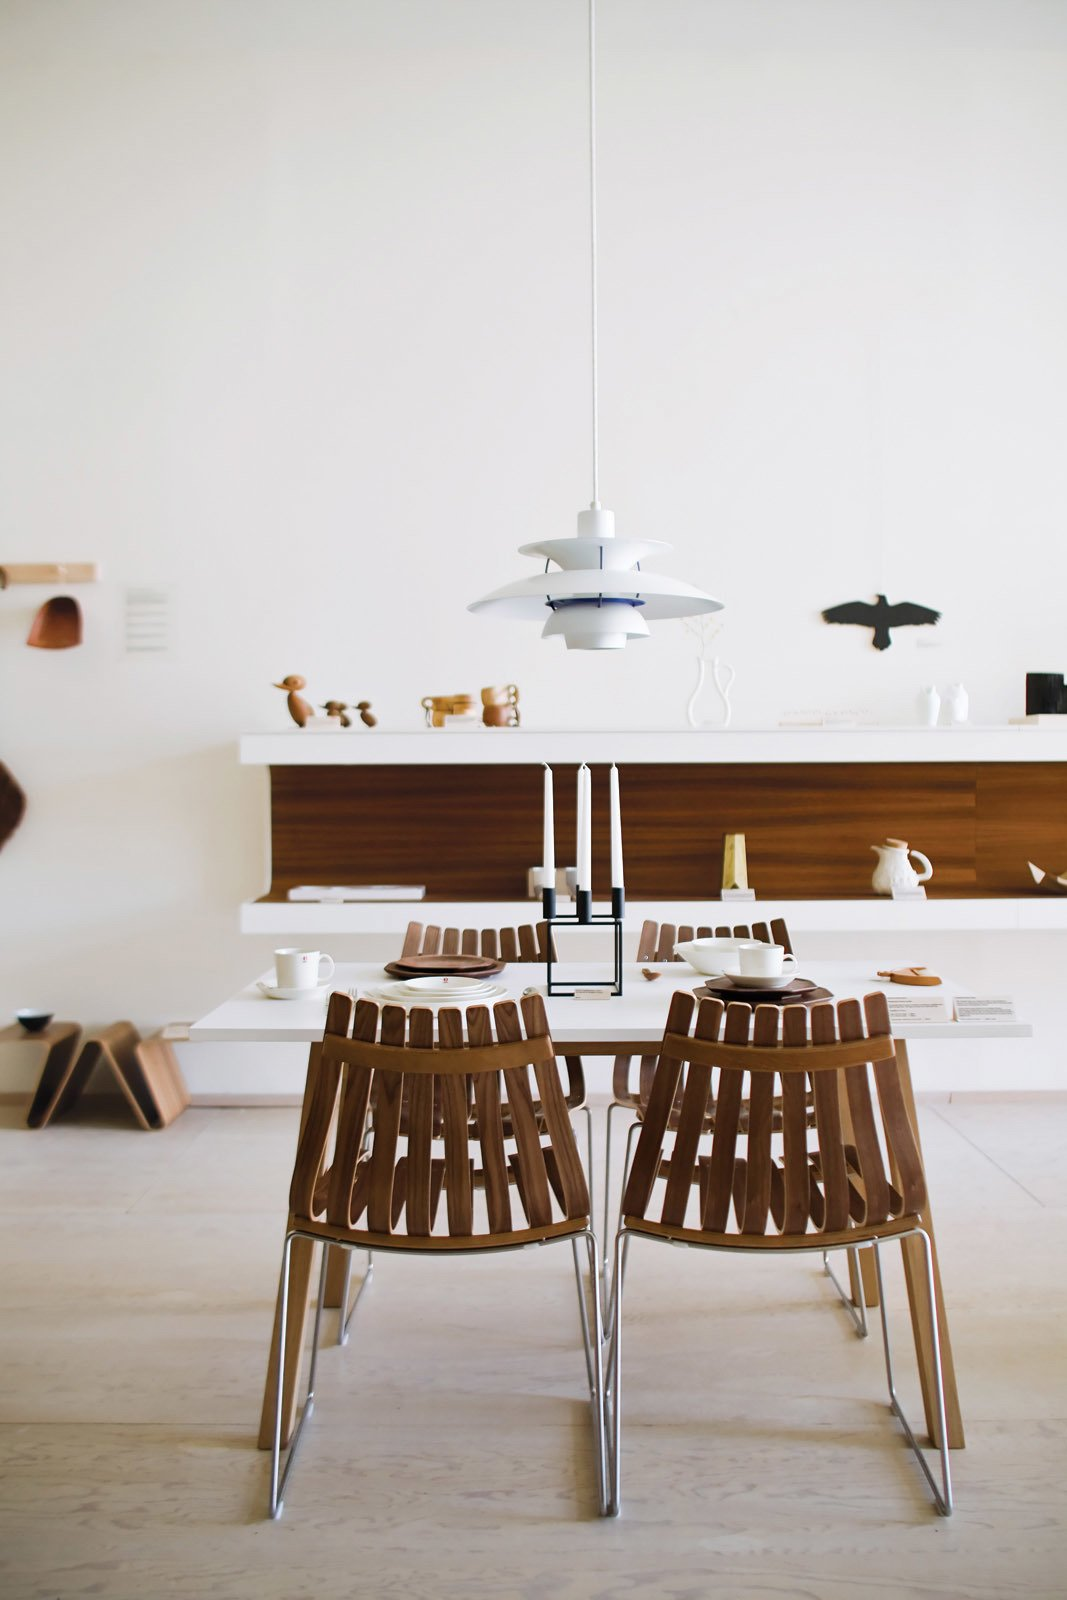 #lighting #modern #moderndesign #design #interior #whitewall #seatingdesign #dining #louispoulsen #lamp #scandia #chairs #PH5lamp #sandratable #thomassandell #asplund #hansbrattrud #fjordfiesta   60+ Modern Lighting Solutions by Dwell